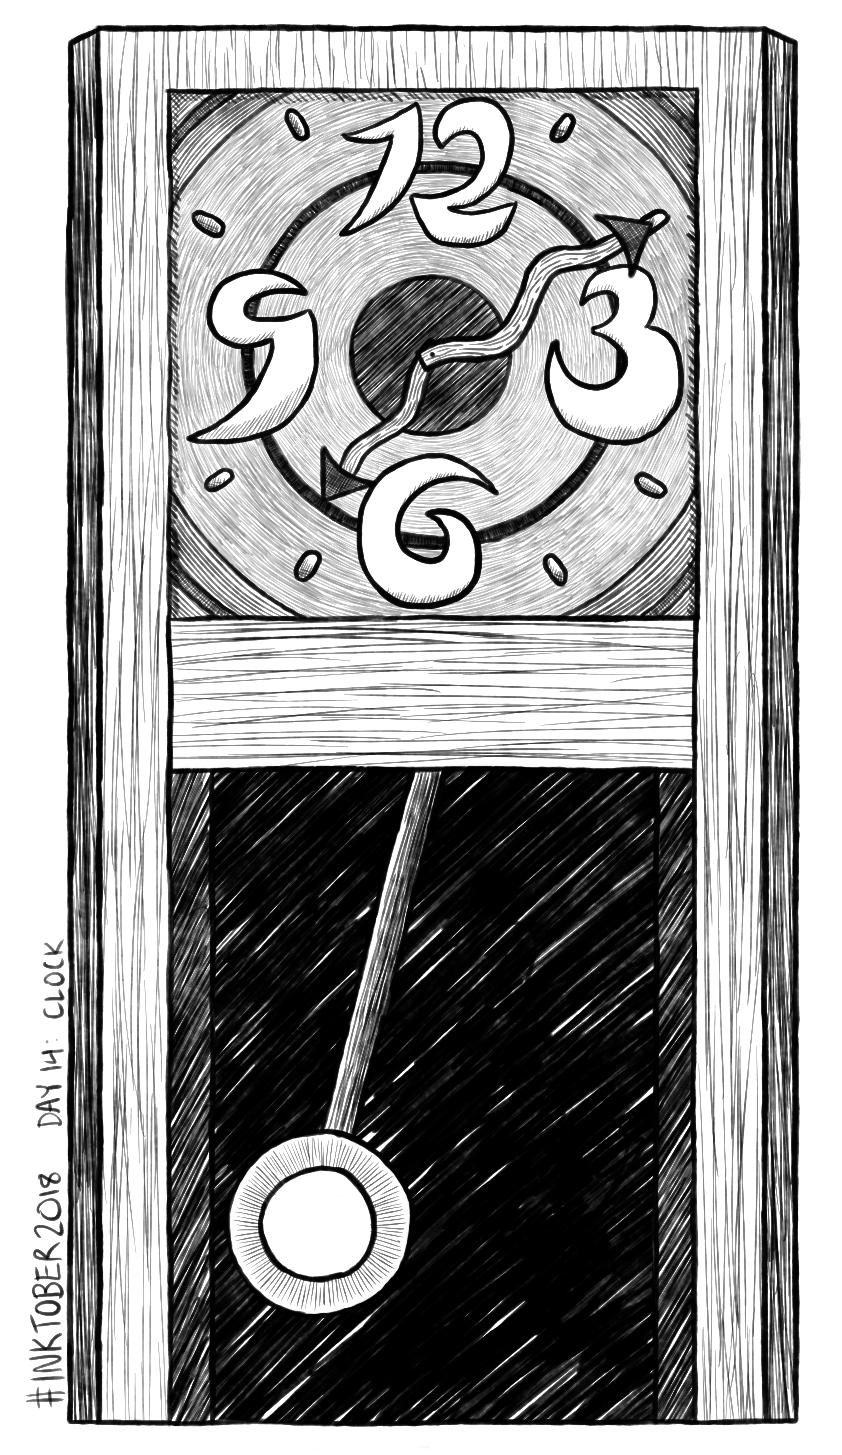 Inktober 2018 Day 14: Clock by Dotsarecool